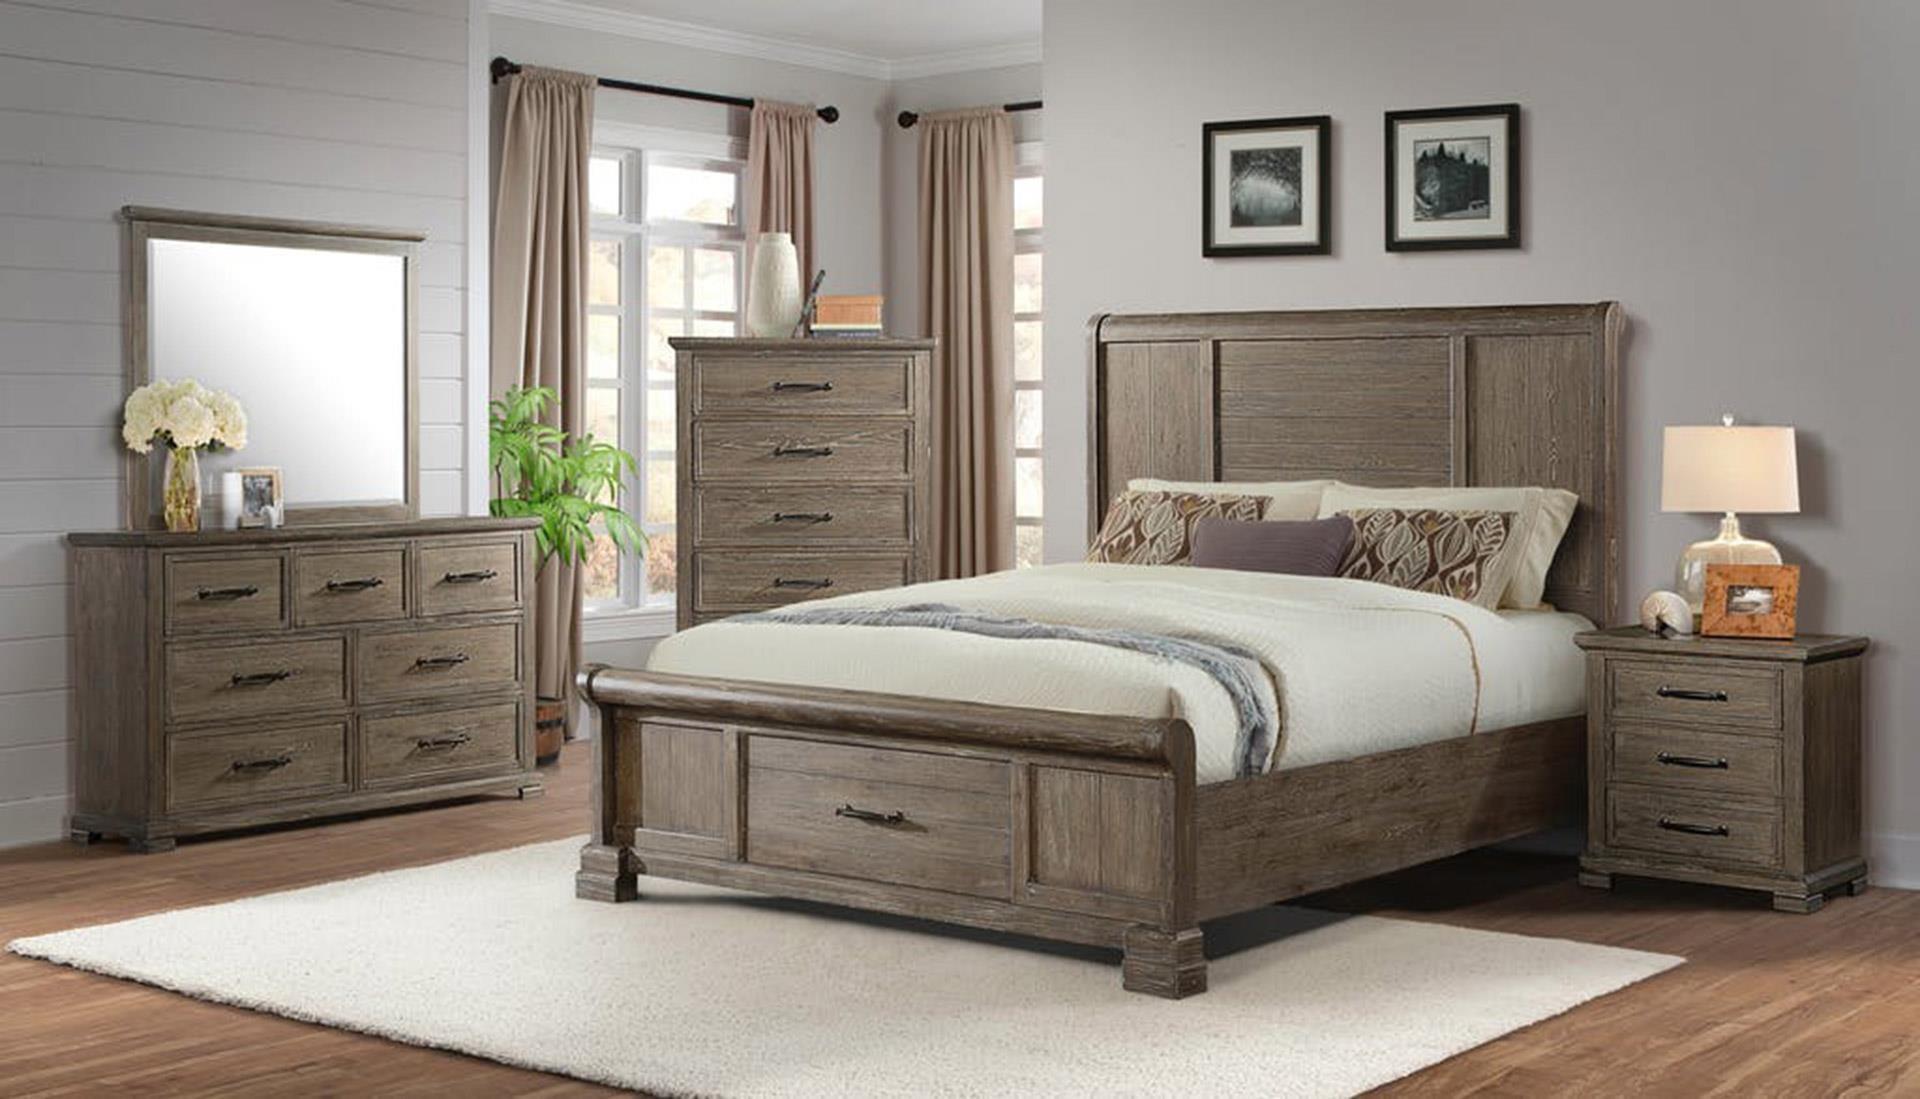 Queen Storage Bed, Dresser, Mirror, and Nightstand